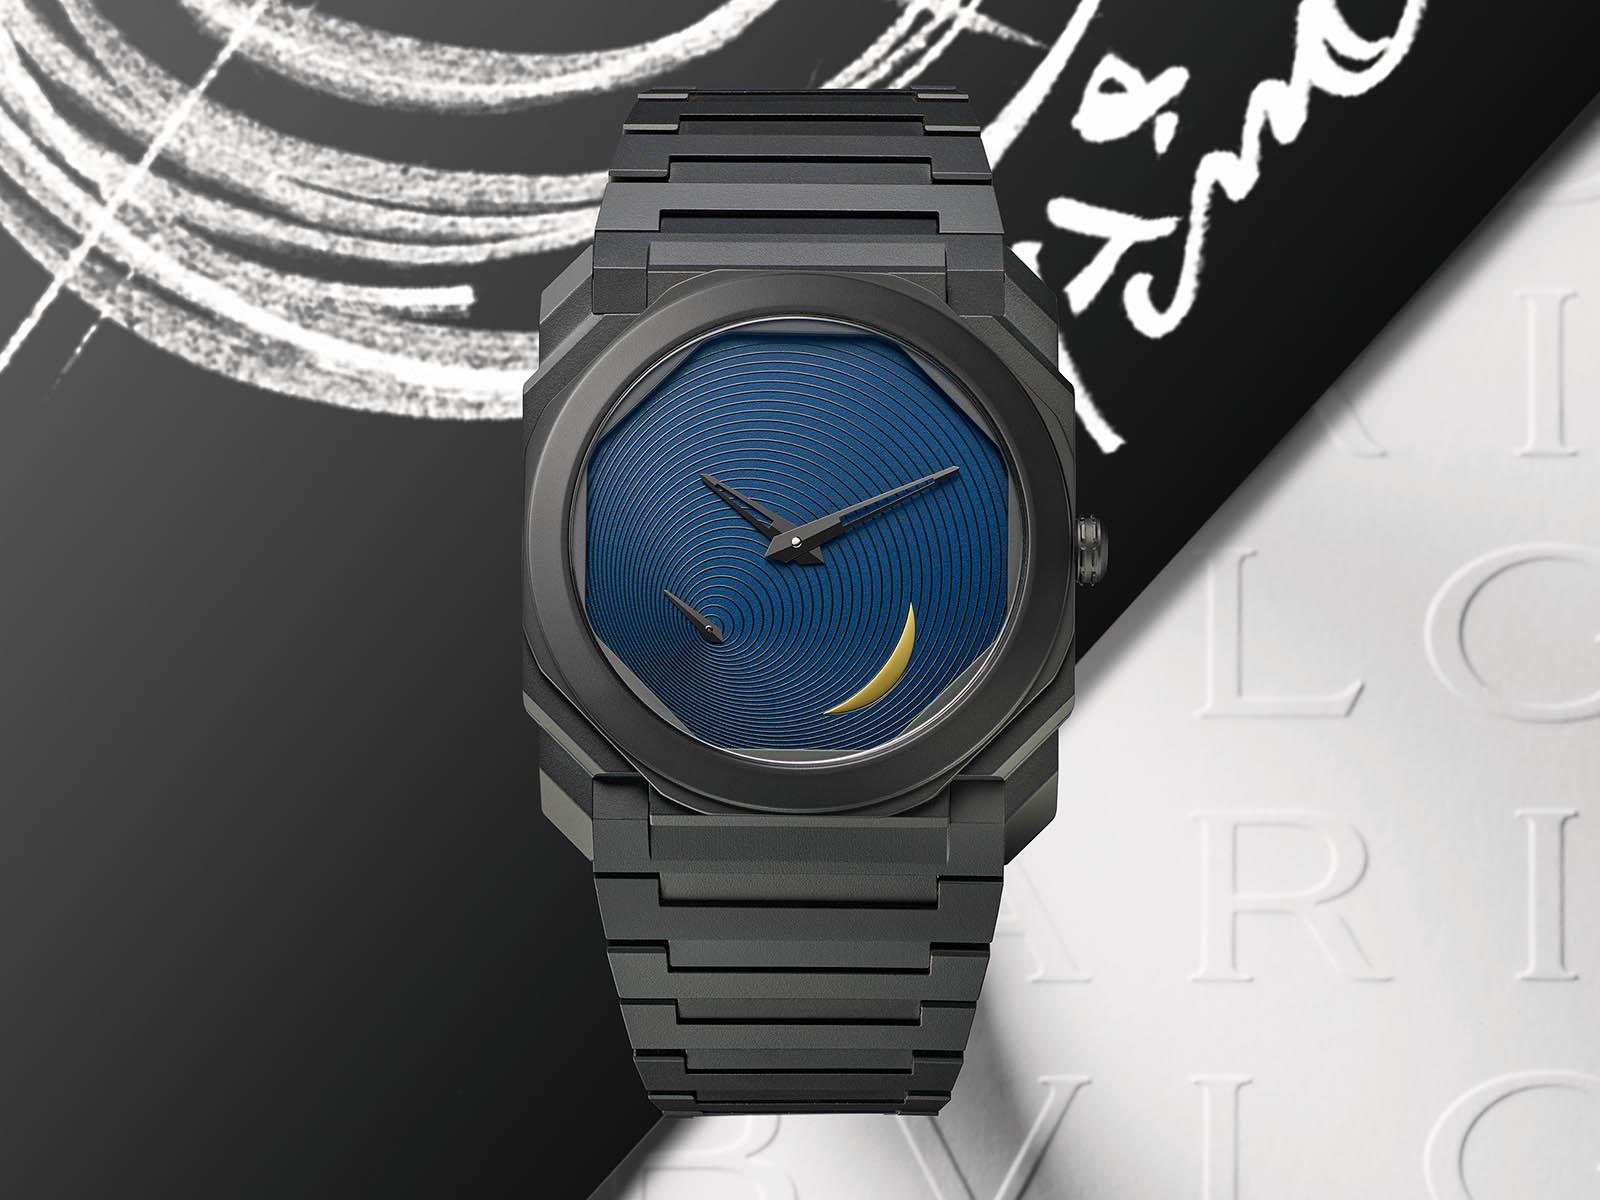 103534-bulgari-octo-finissimo-tadao-ando-limited-edition-1.jpg